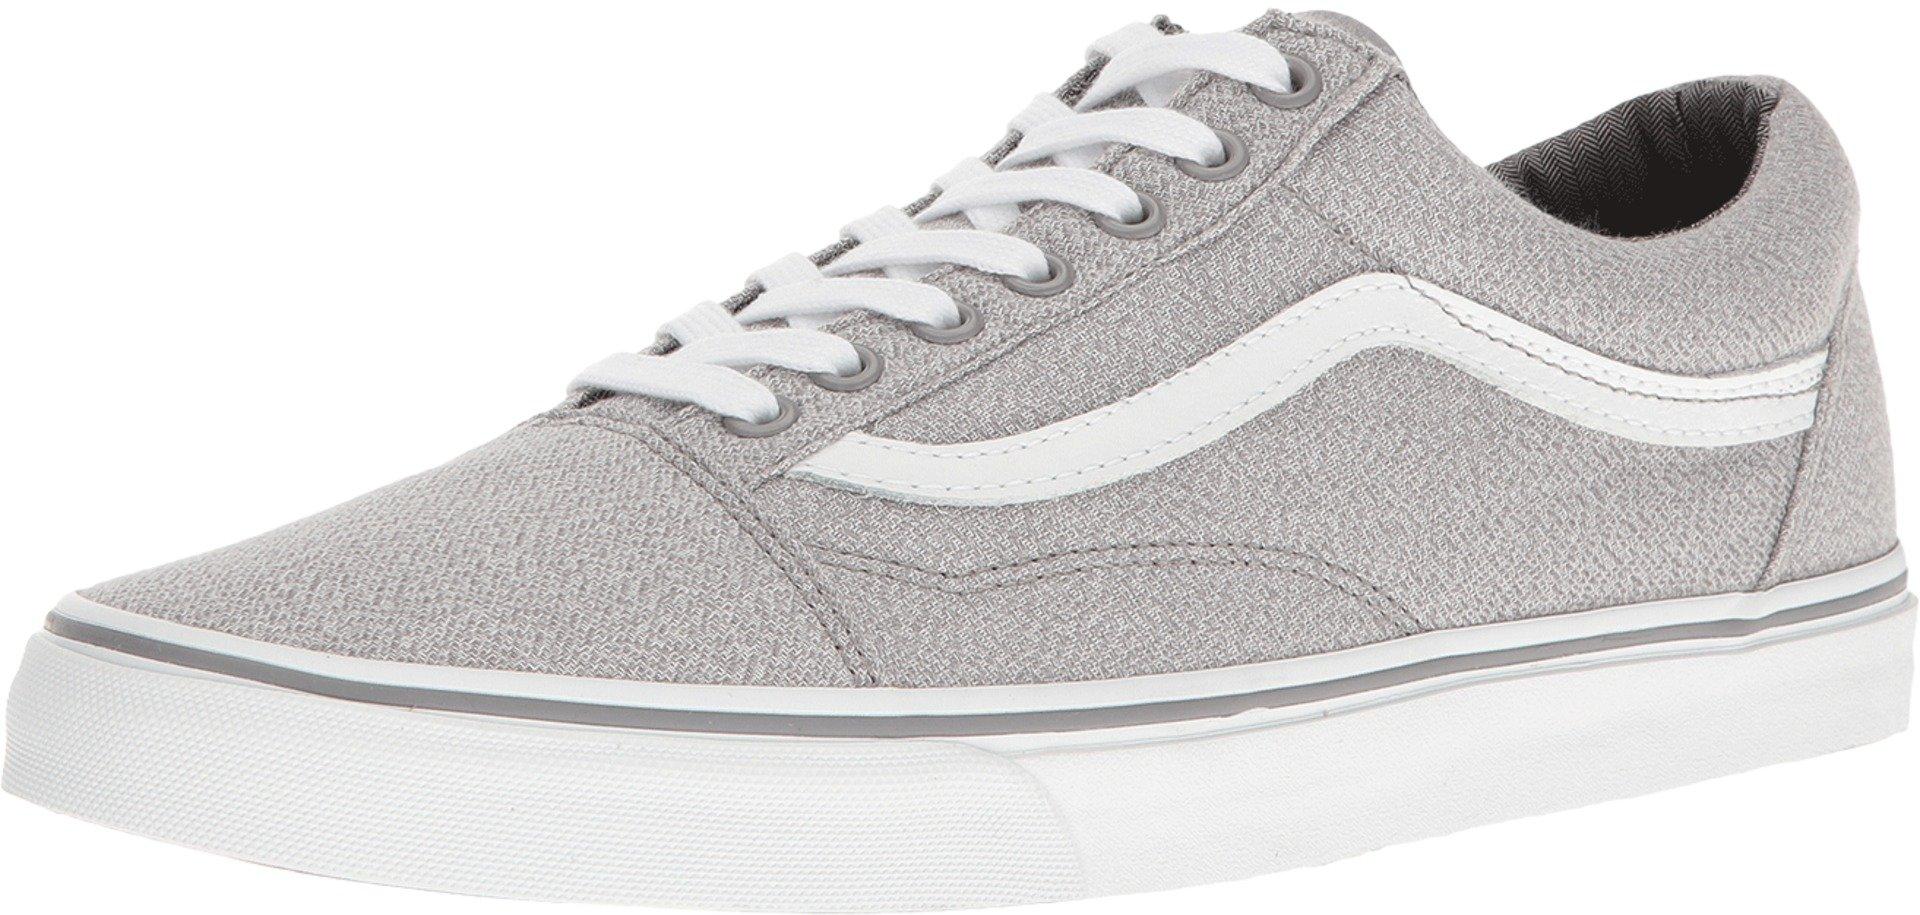 0 Greytrue White D mWomenssuitingFrost 9 Skate mUs Vans 5 Mens Old B Skool Shoe7 2H9EDI